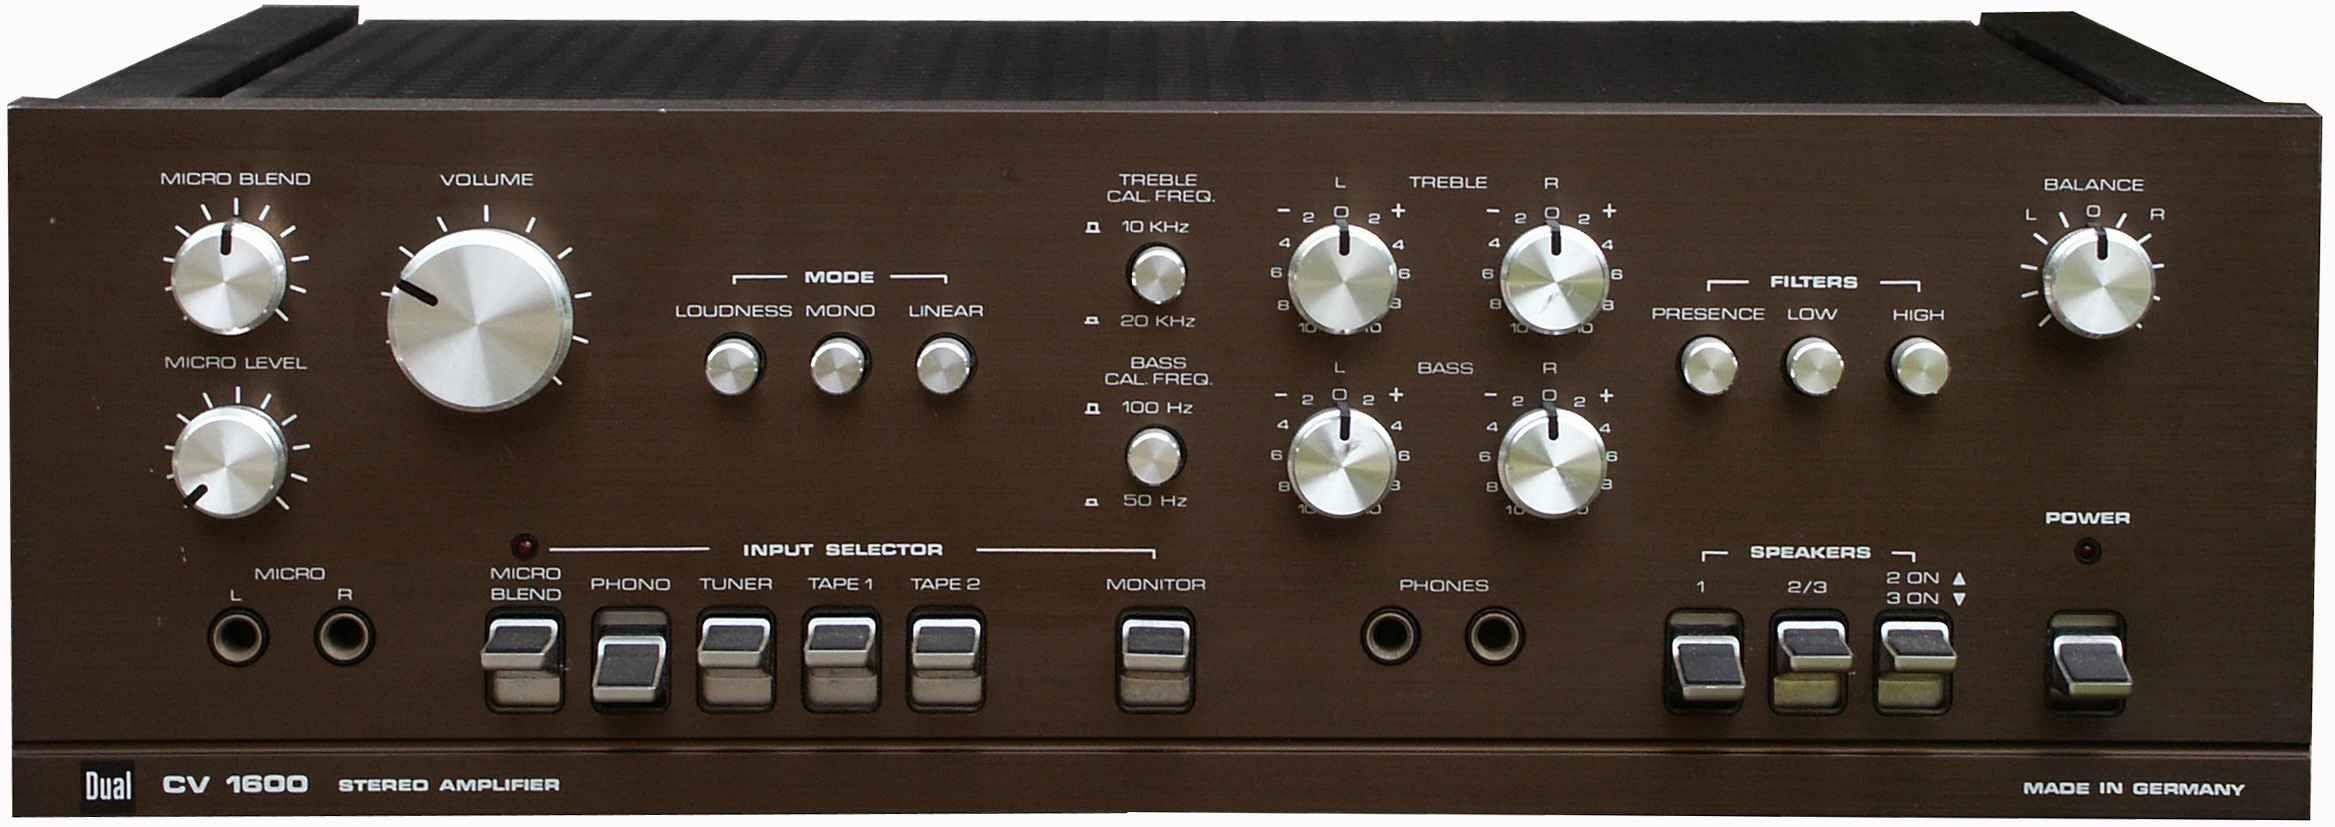 Dual Cv 1600 Hifi Dual Audio